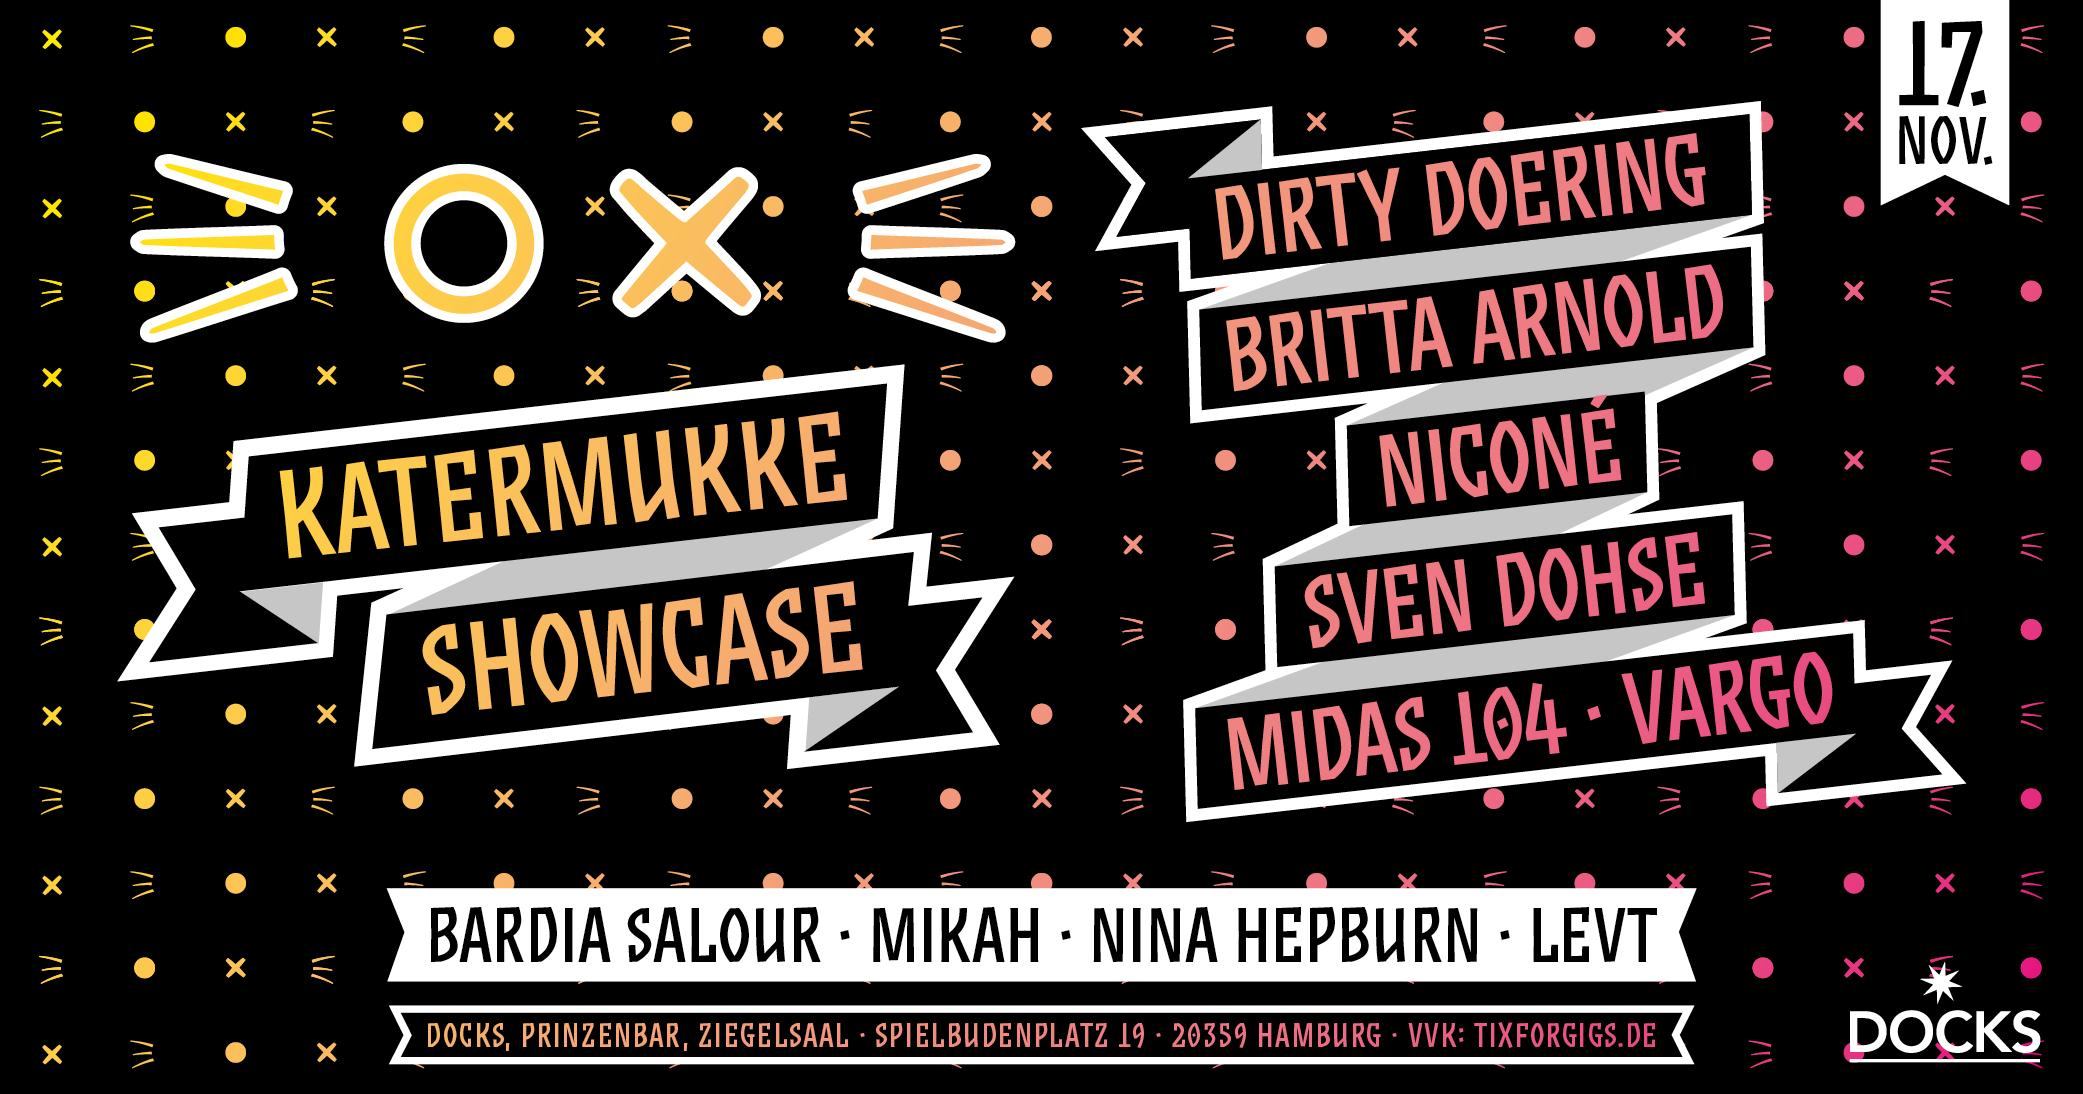 Preview: Katermukke Showcase